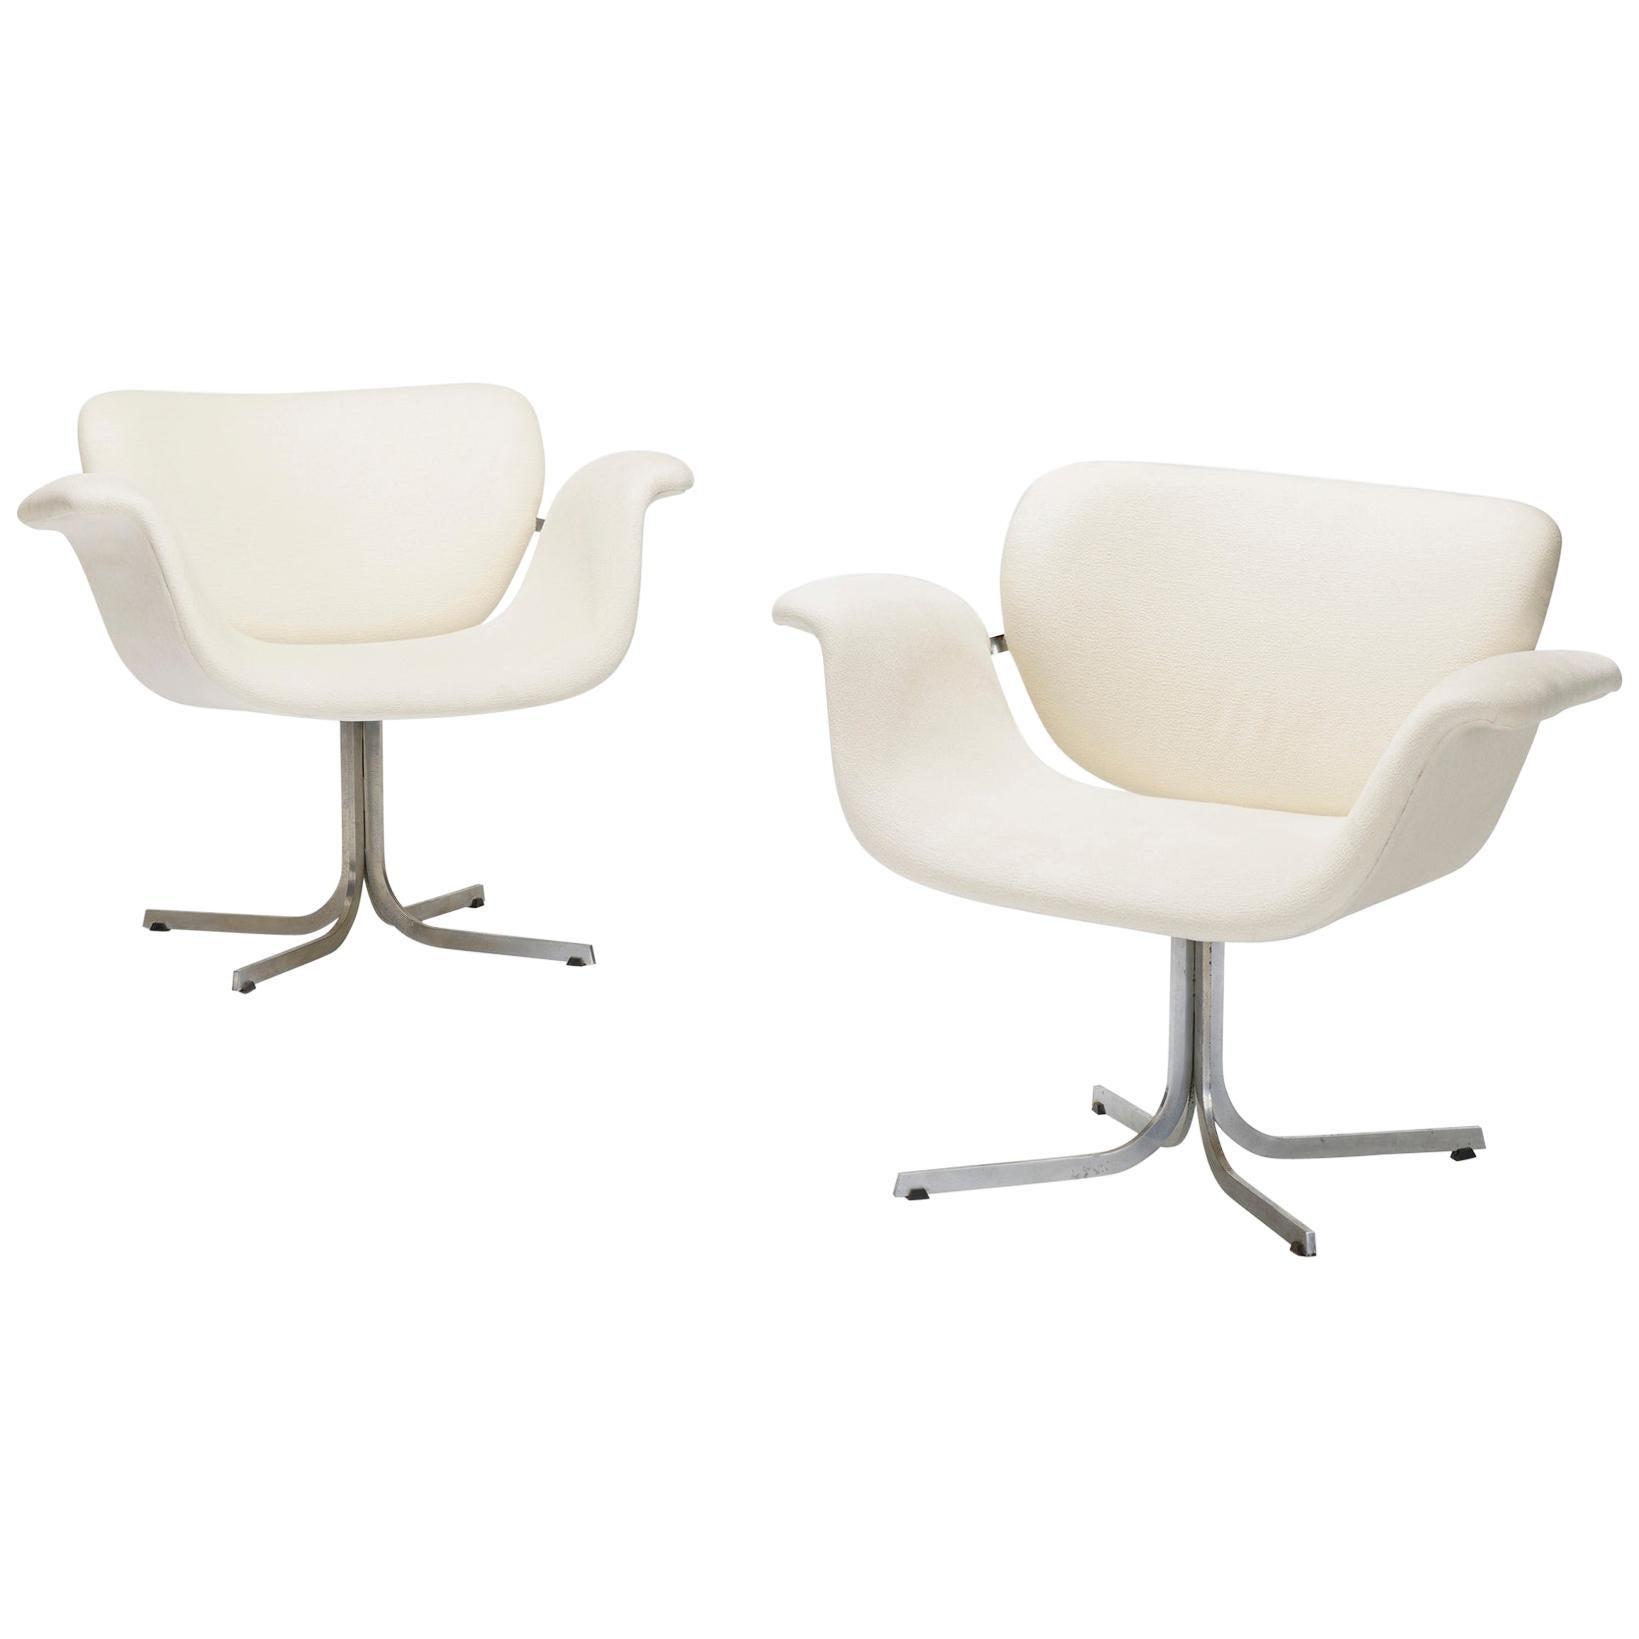 "Pierre Paulin ""Big Tulip Lounge Chairs"", 1960s"